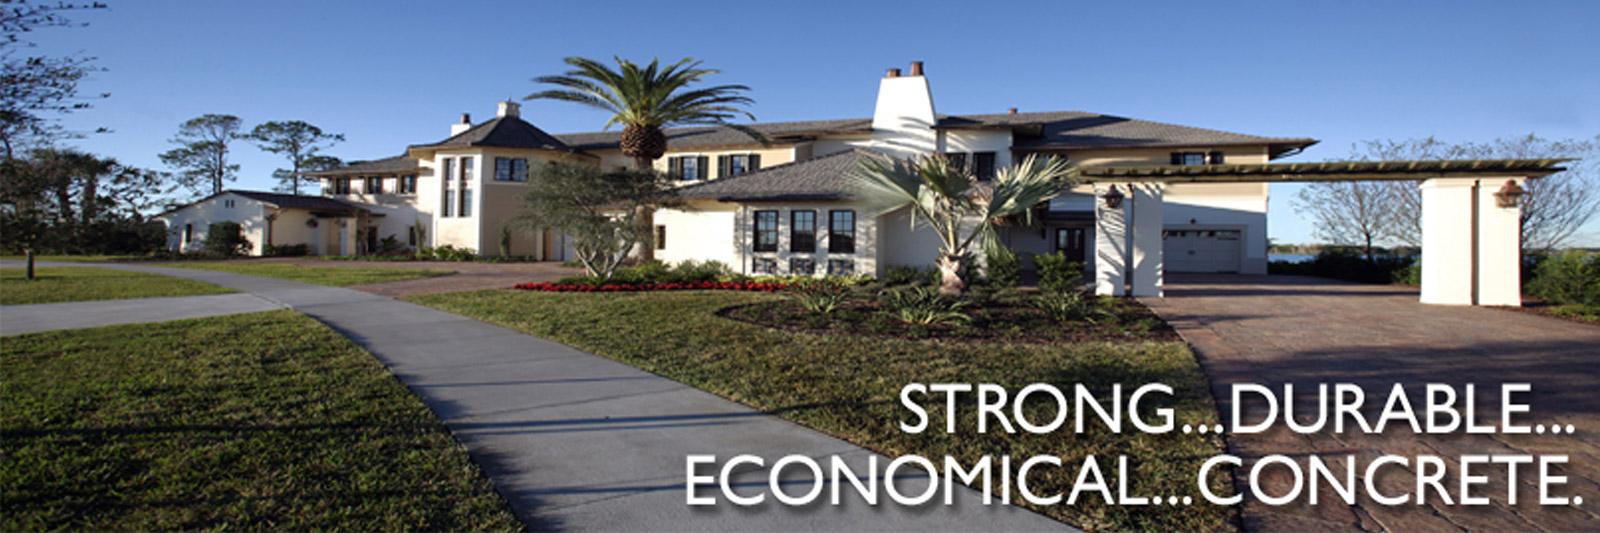 Strong, Durable, Economical Concrete